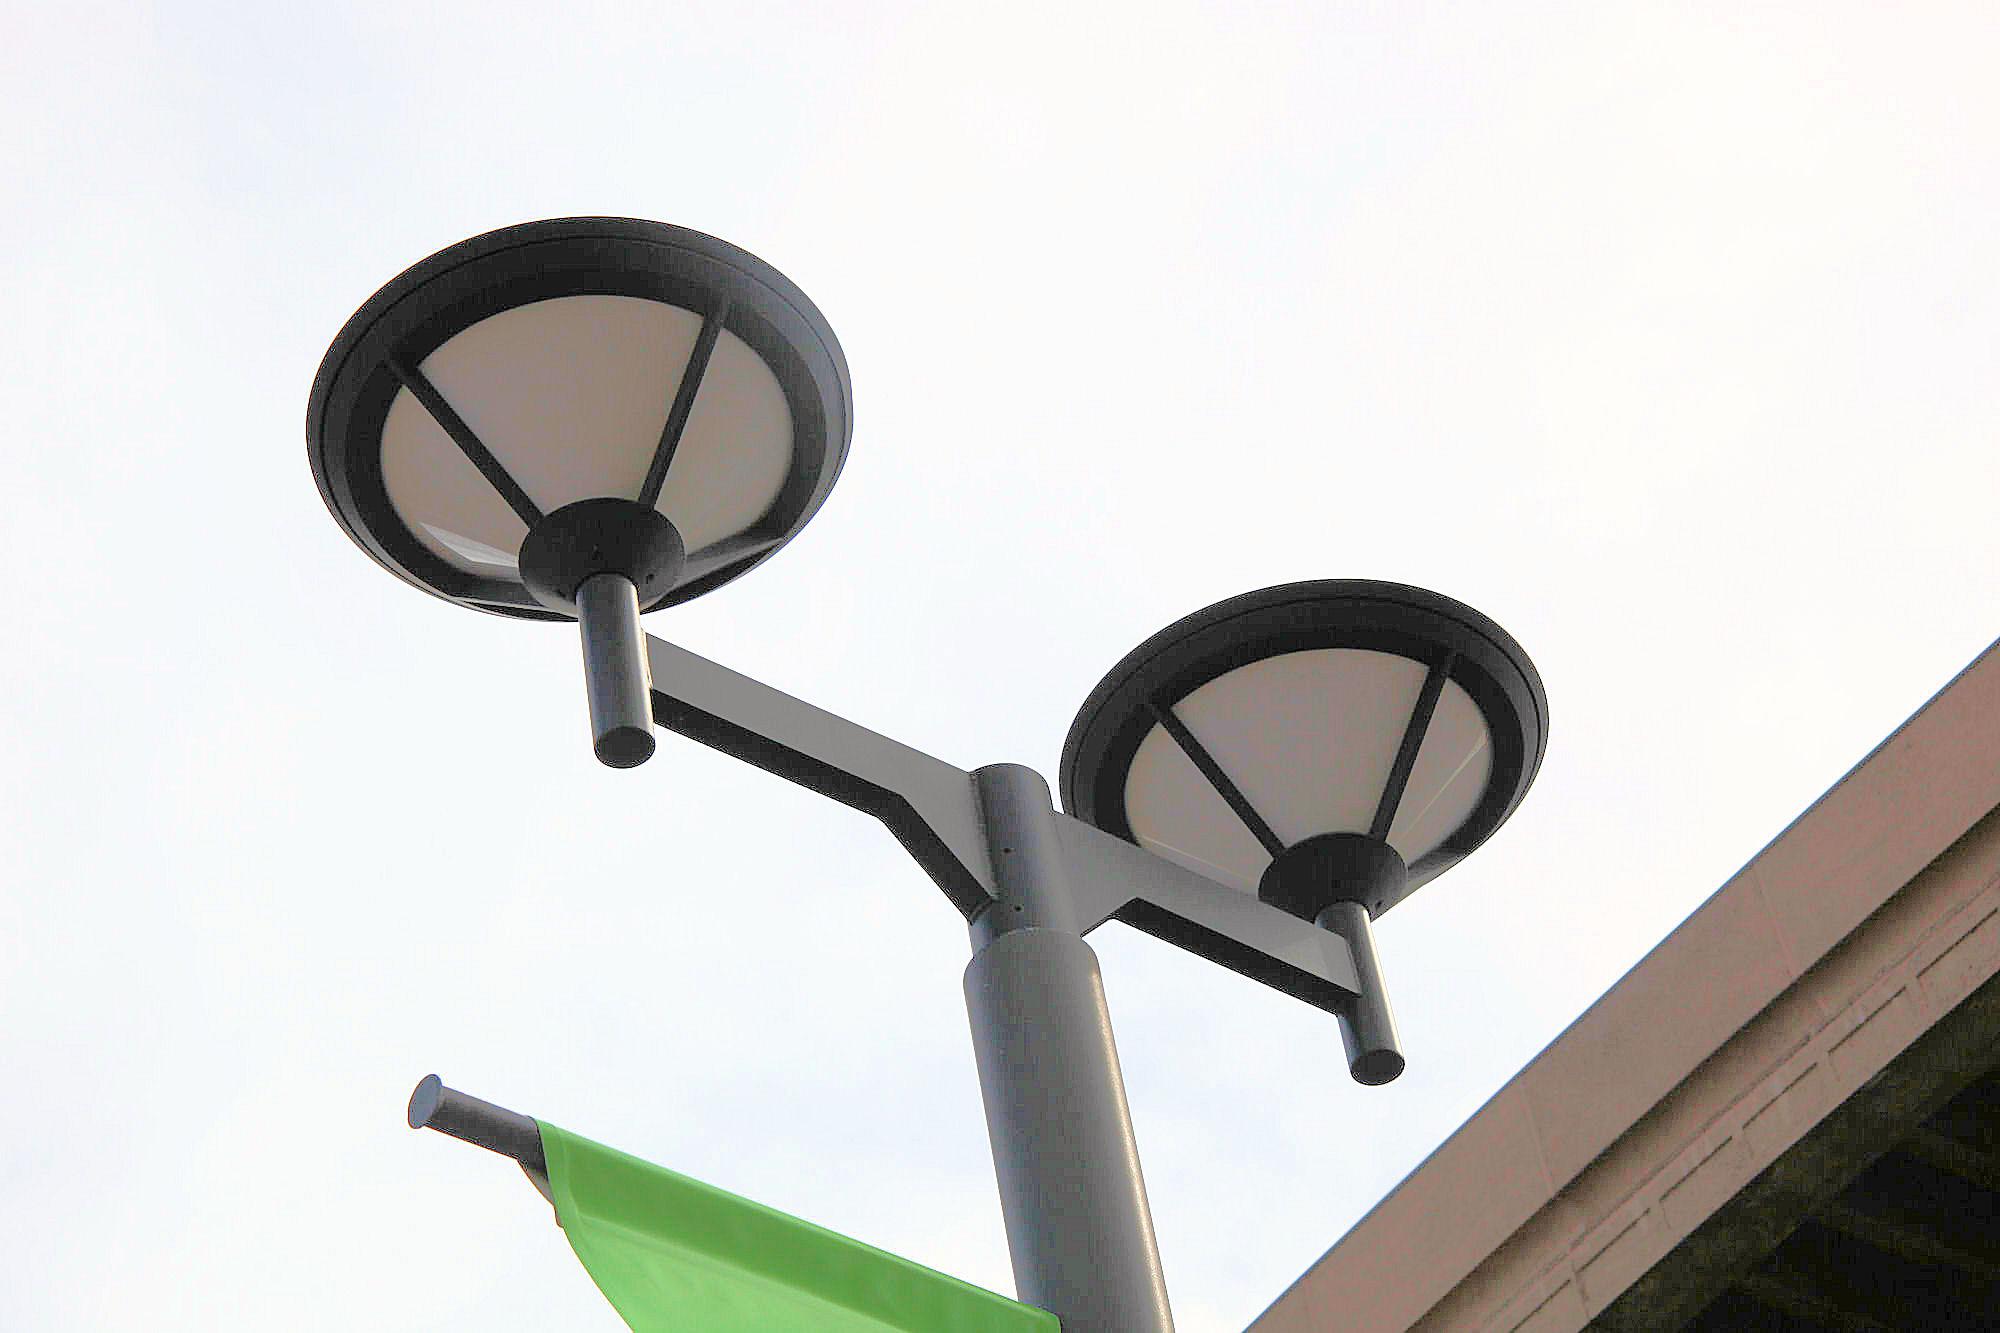 Filenew lighting fixture lenfant plaza washington dc jpg